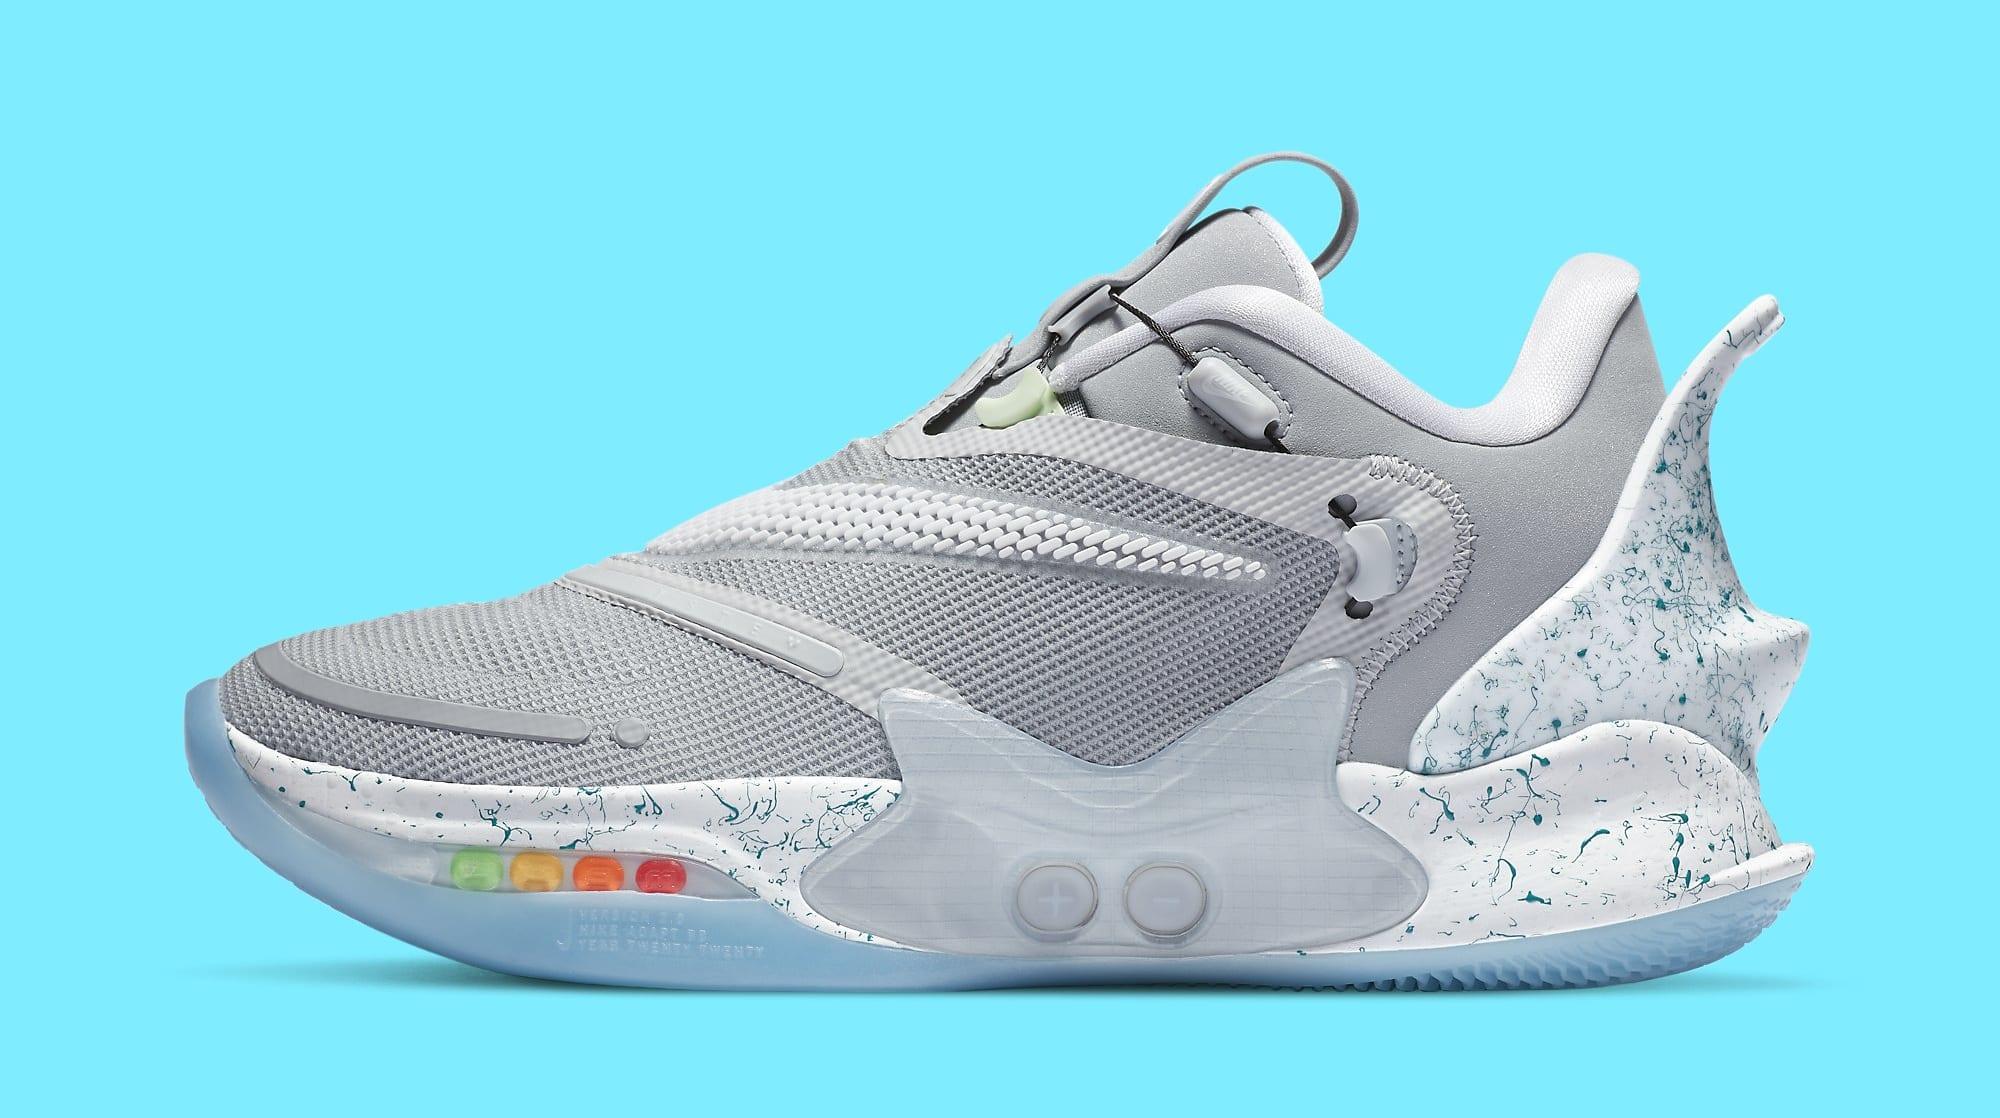 Nike Adapt BB 2.0 'Mag' BQ5397-003 Lateral